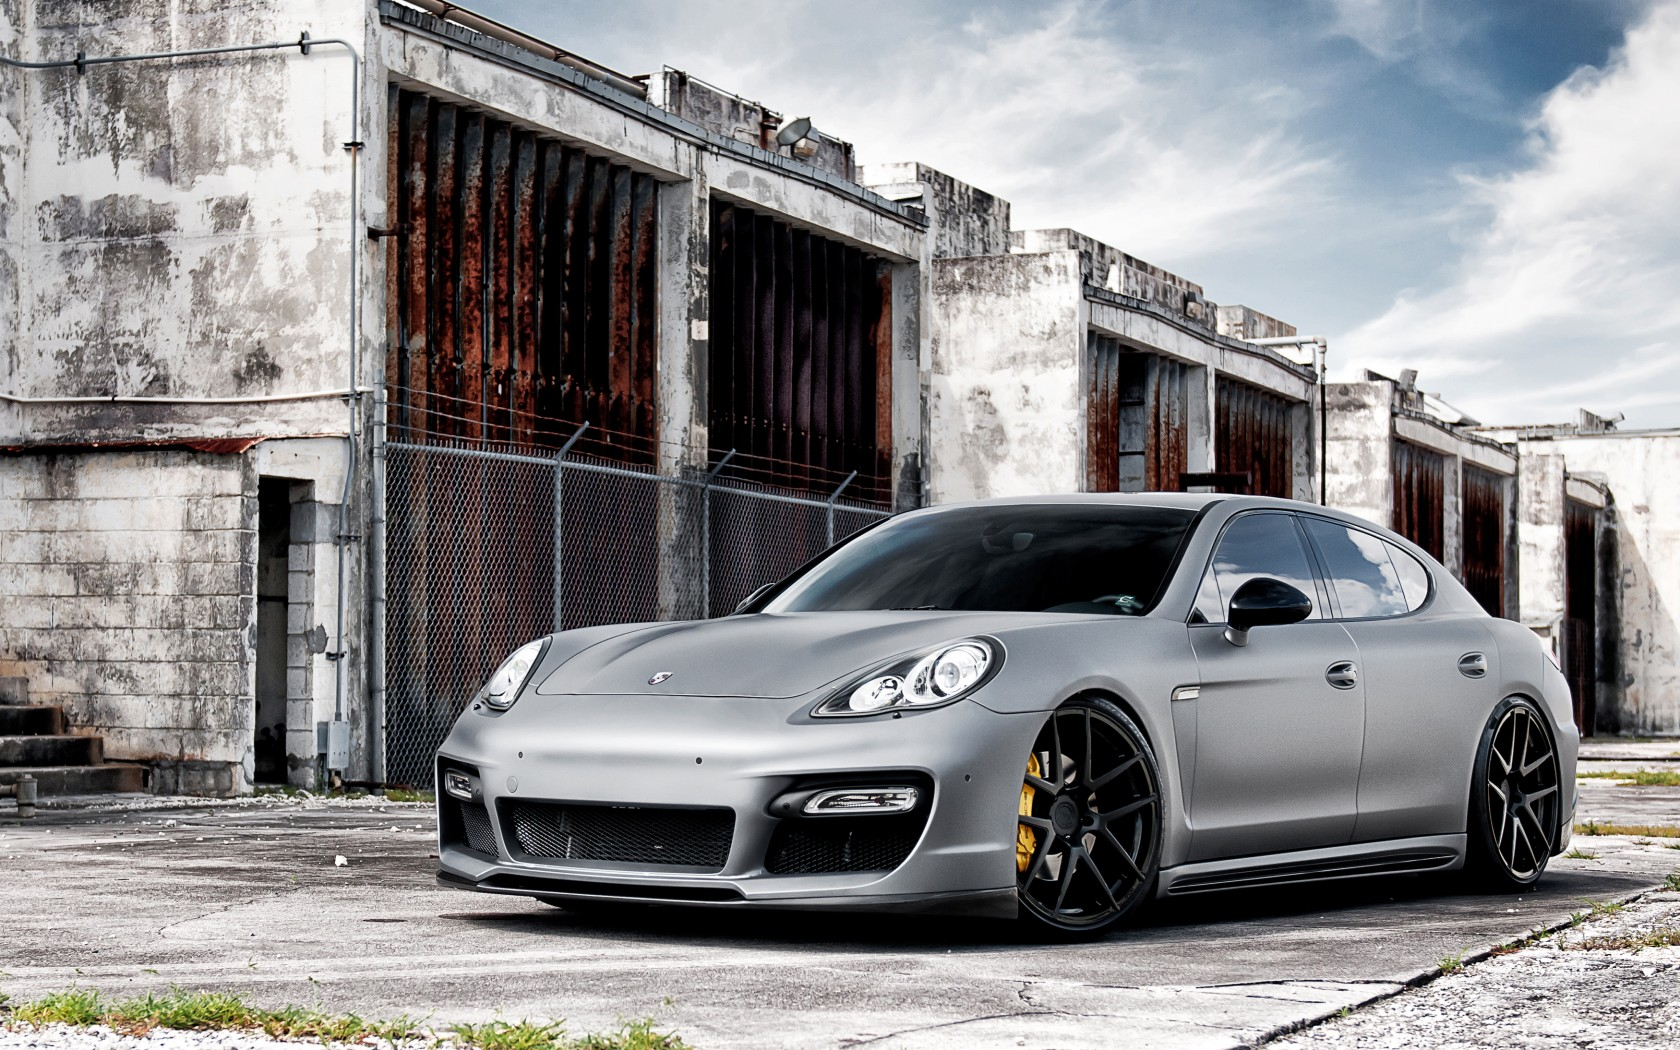 Porsche Panamara on ADV1 Wheels Wallpaper | HD Car Wallpapers